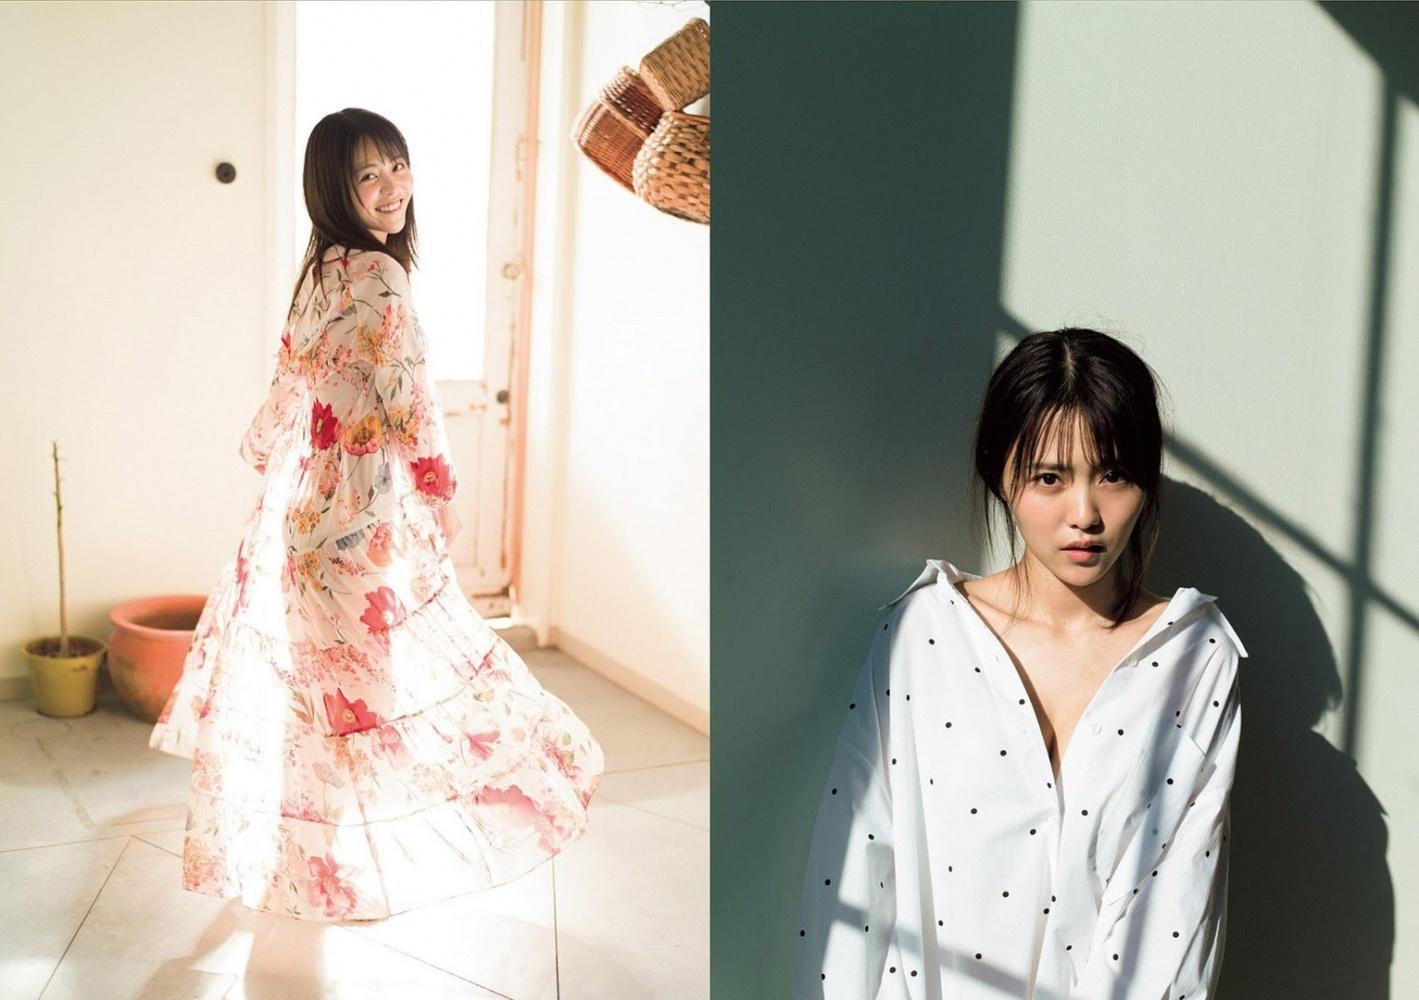 [日本]选美比赛亚军.新田さちか甜美外型深受喜爱 网络美女 第1张